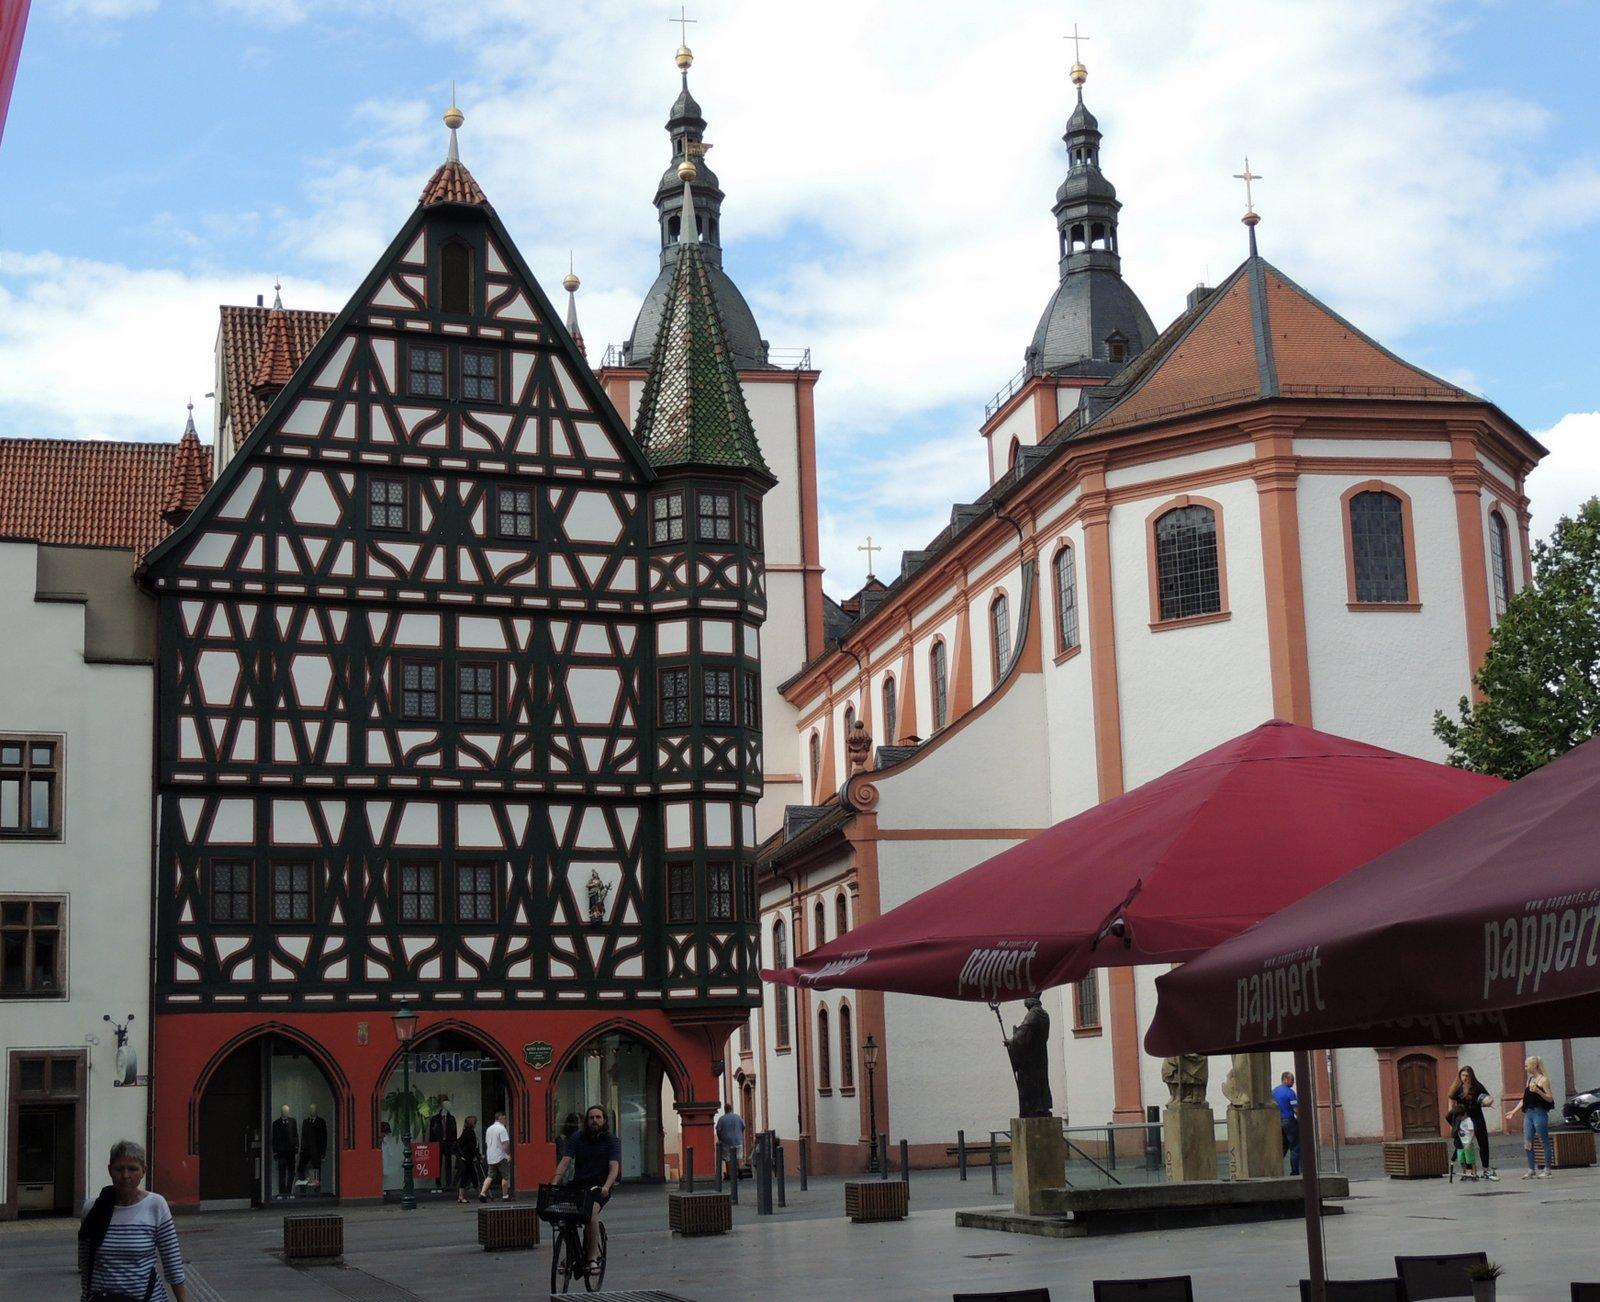 Barocke Altstadt von Fulda